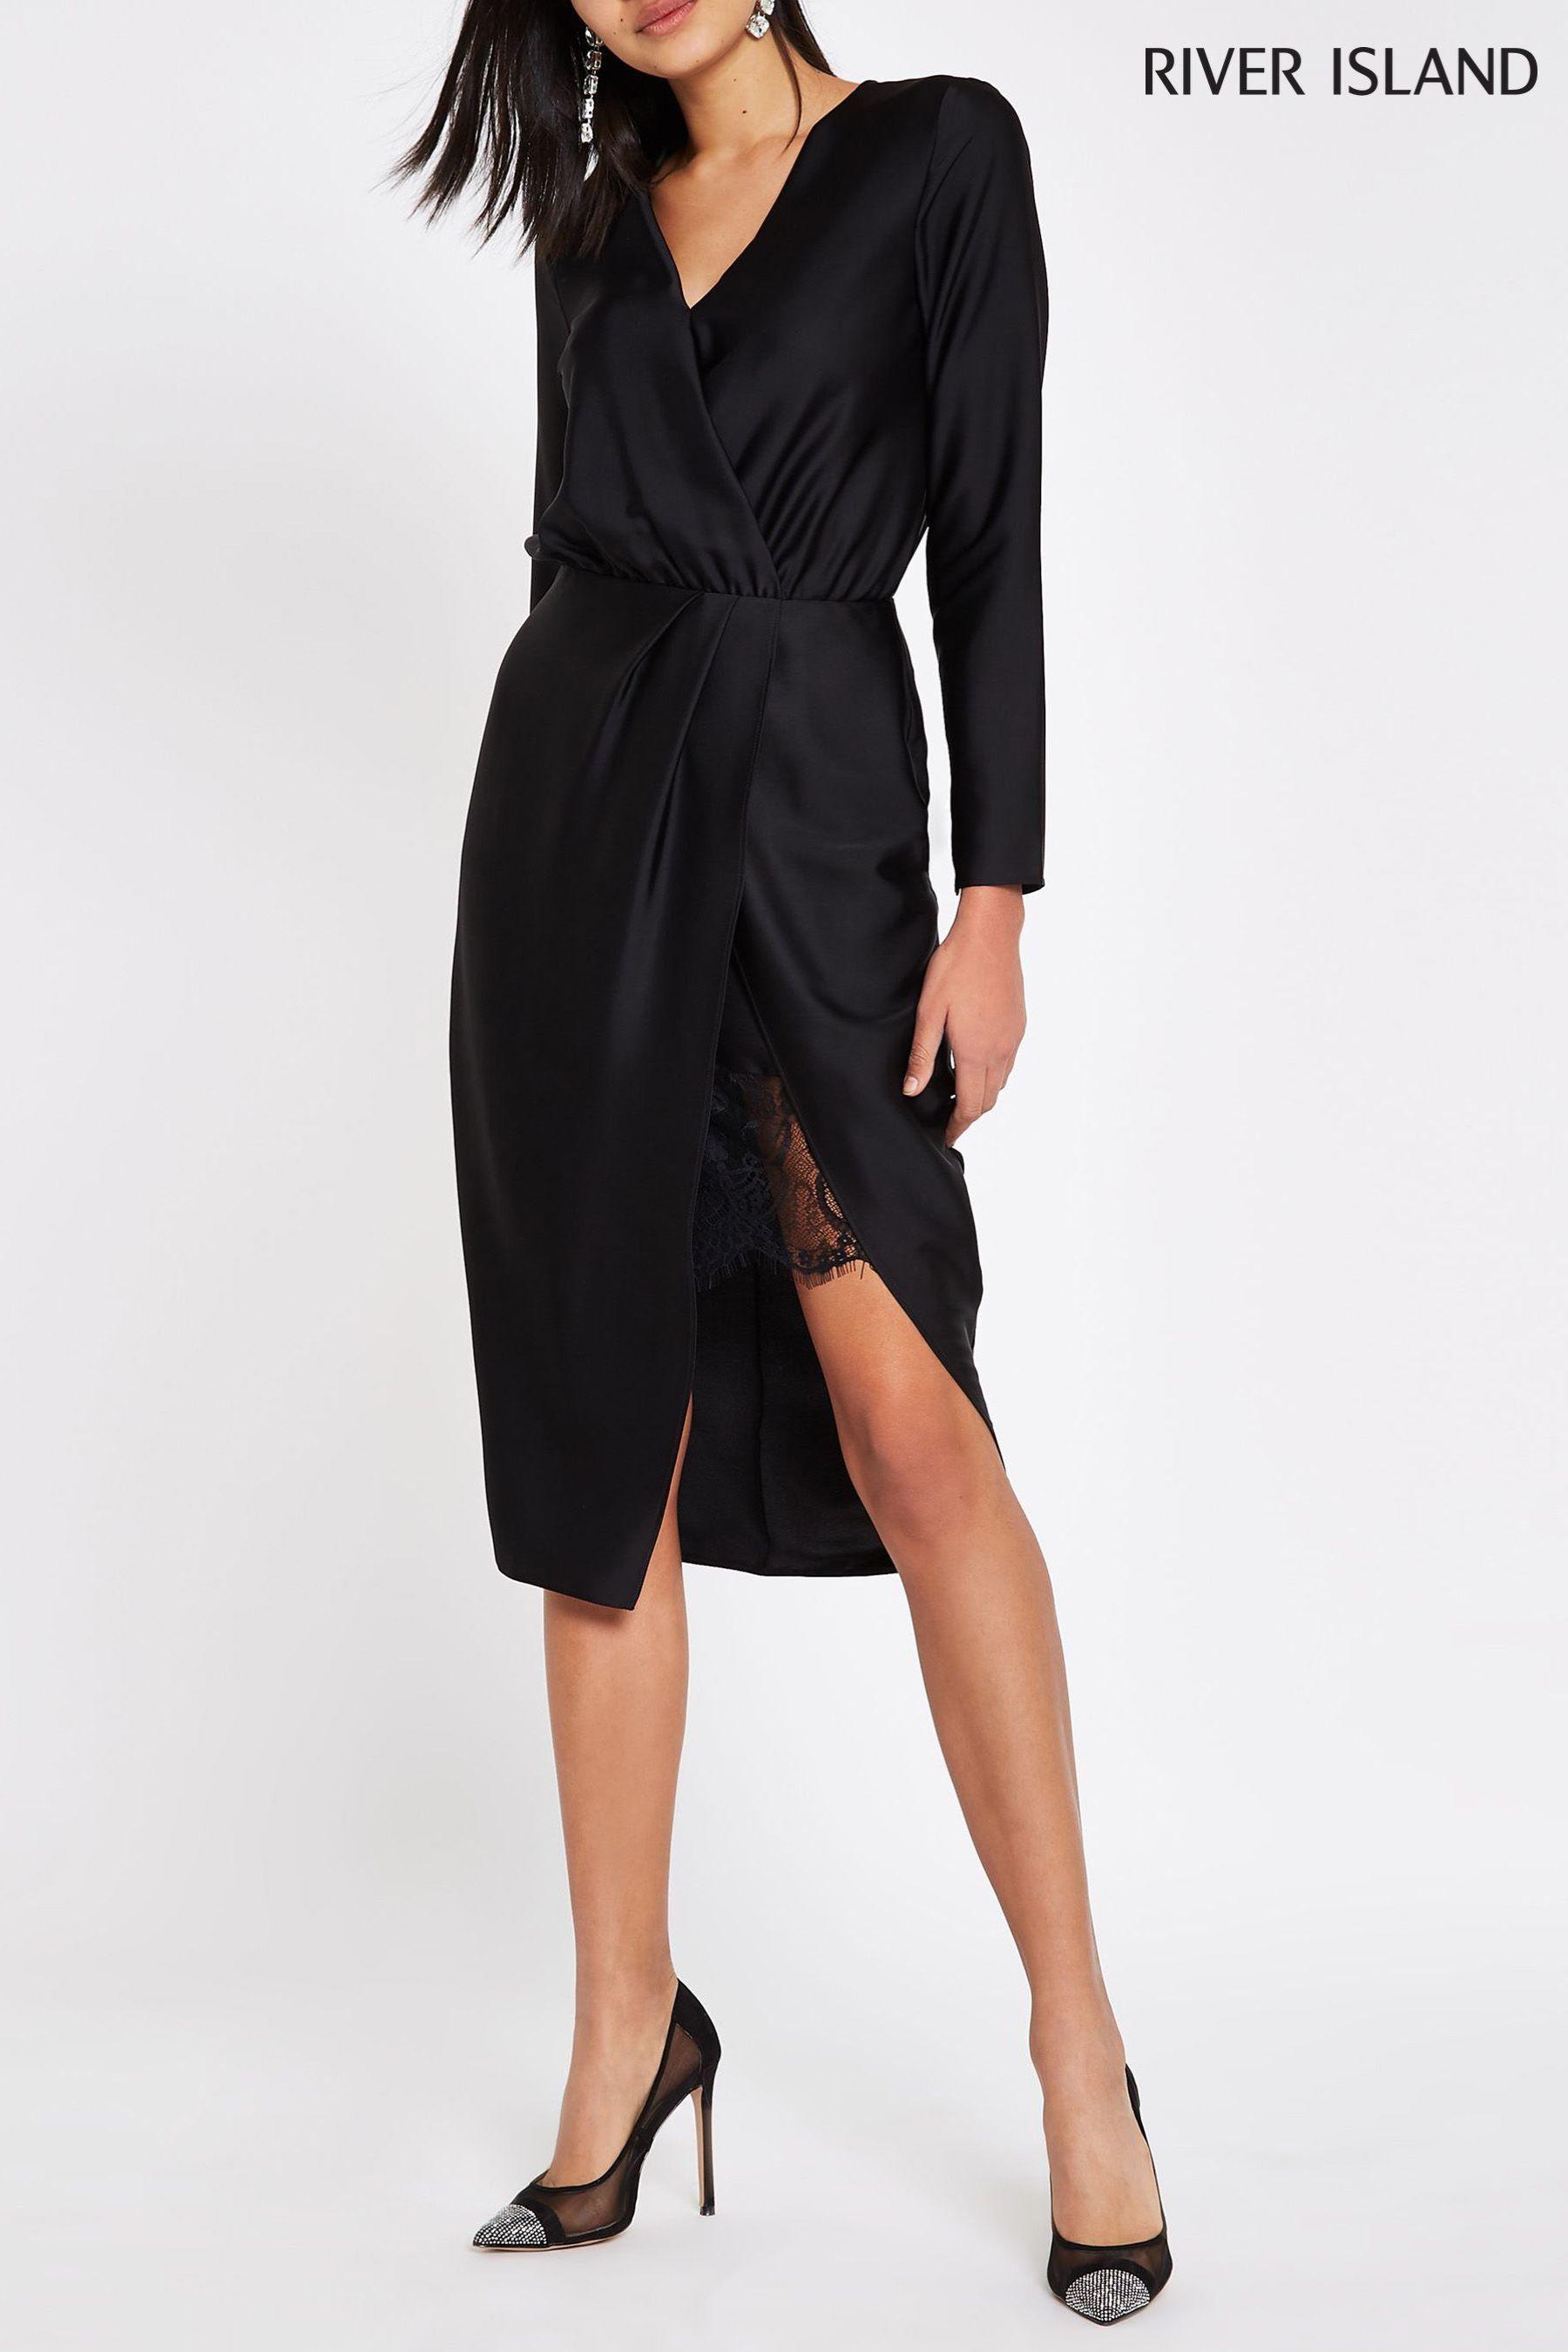 81aaaf9e0 Womens River Island Wrap Long Sleeve Satin Dress - Black | art in ...